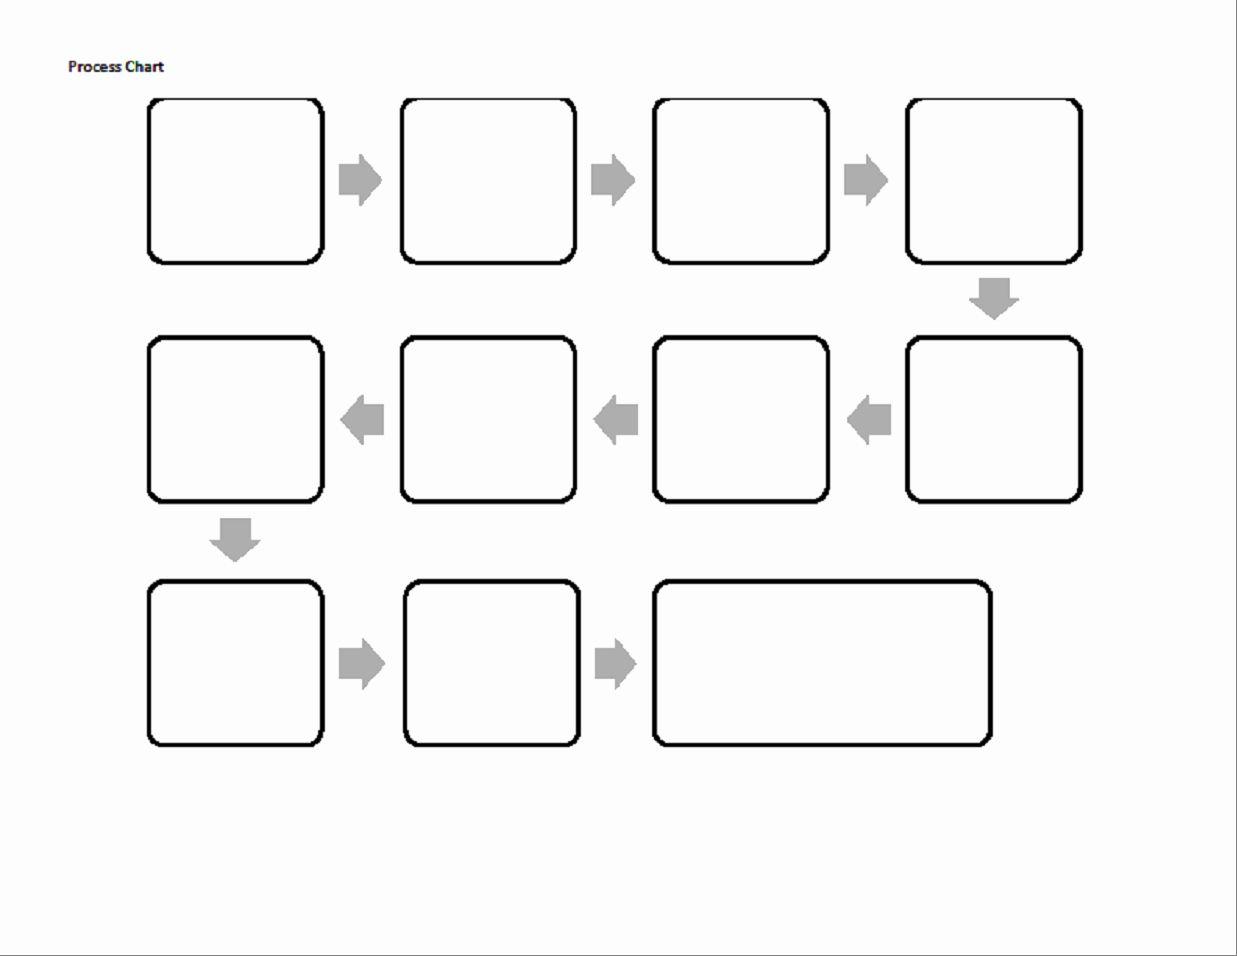 Blank Flow Chart Template Elegant Process Chart Blank 150 In 2020 Flow Chart Template Process Chart Process Flow Chart